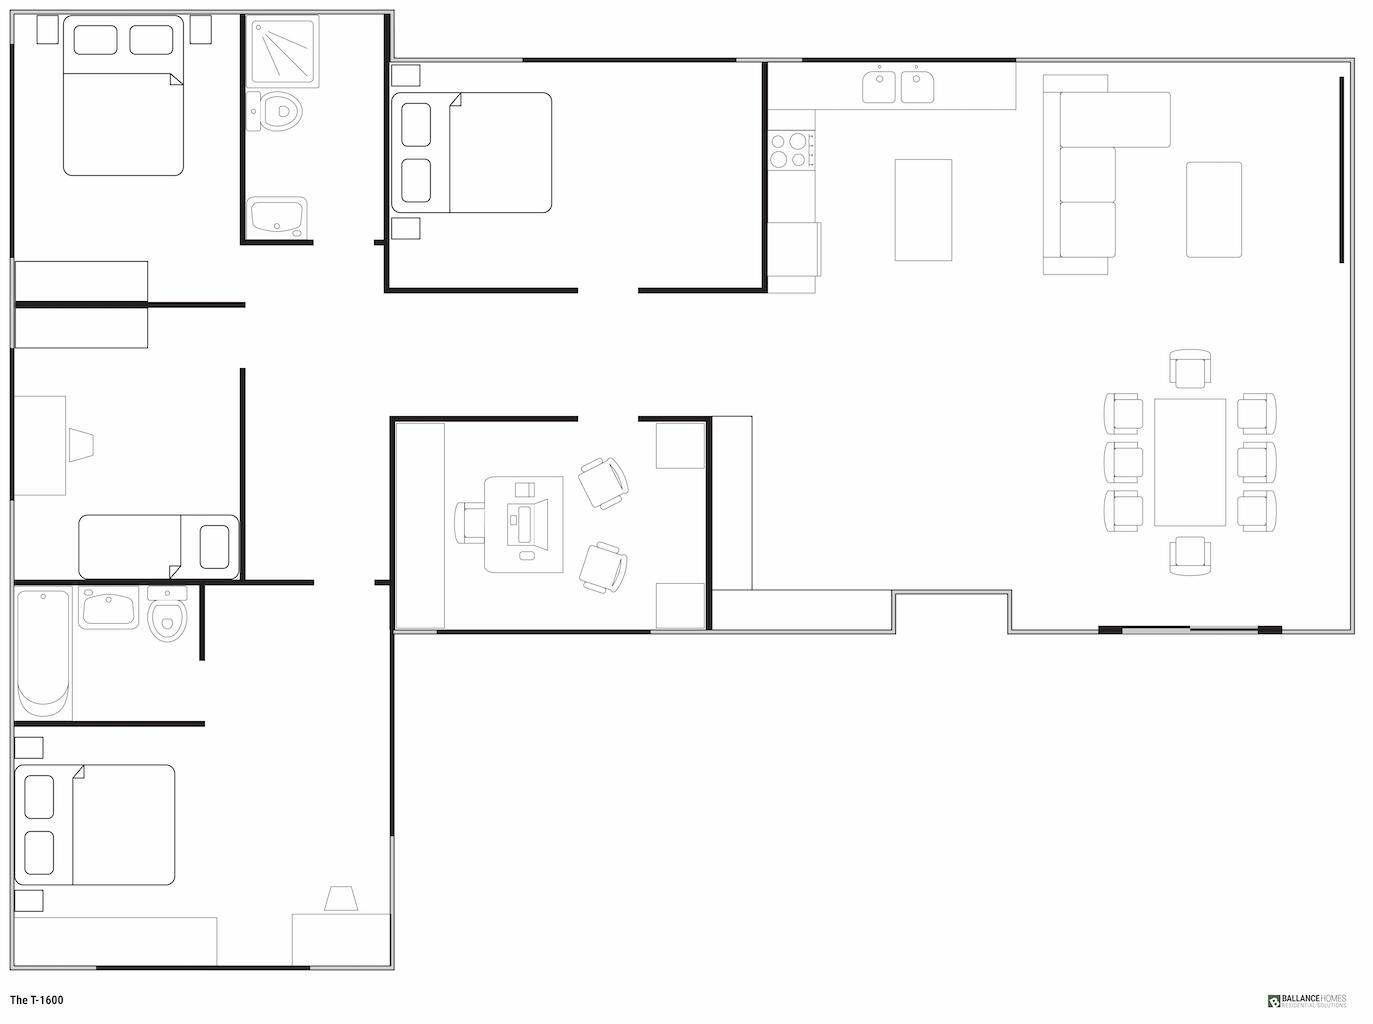 T1600_Floorplan